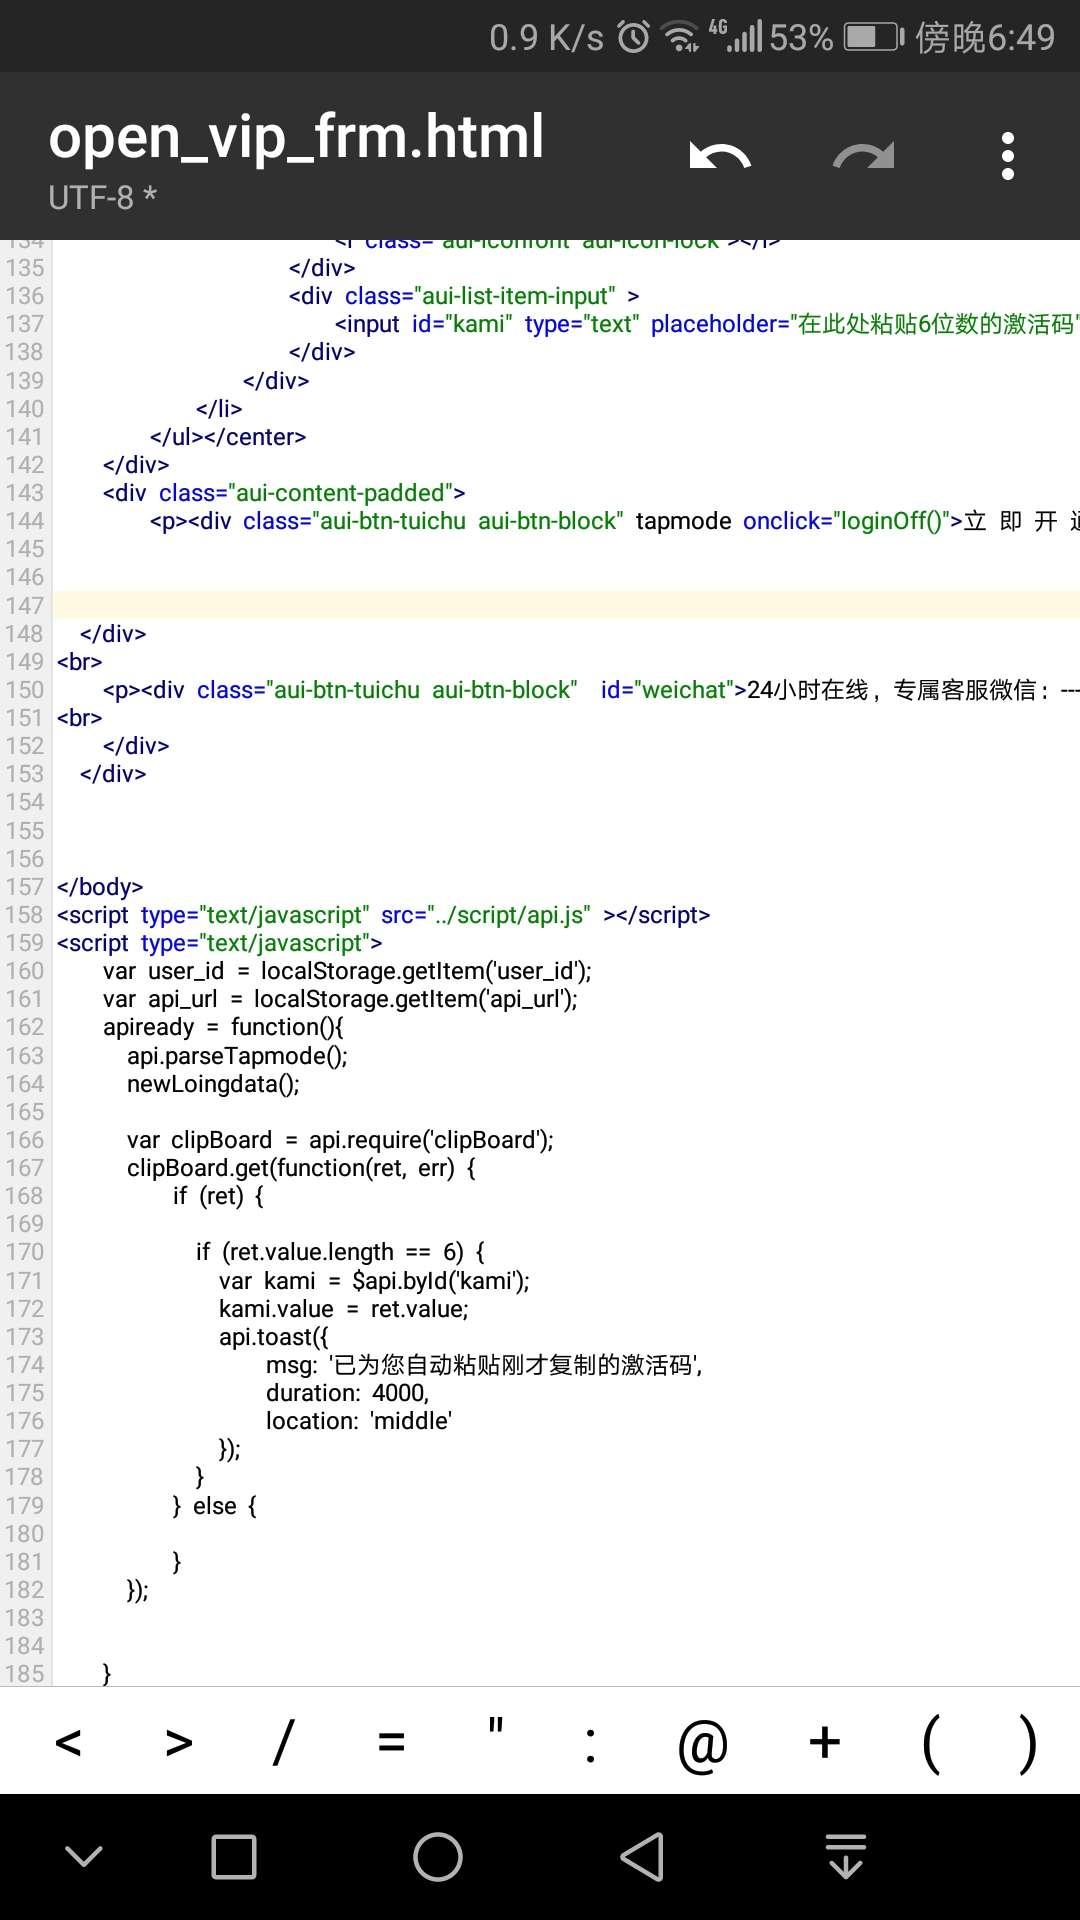 【DMT】千月影视apk去除某些界面教程①-www.im86.com